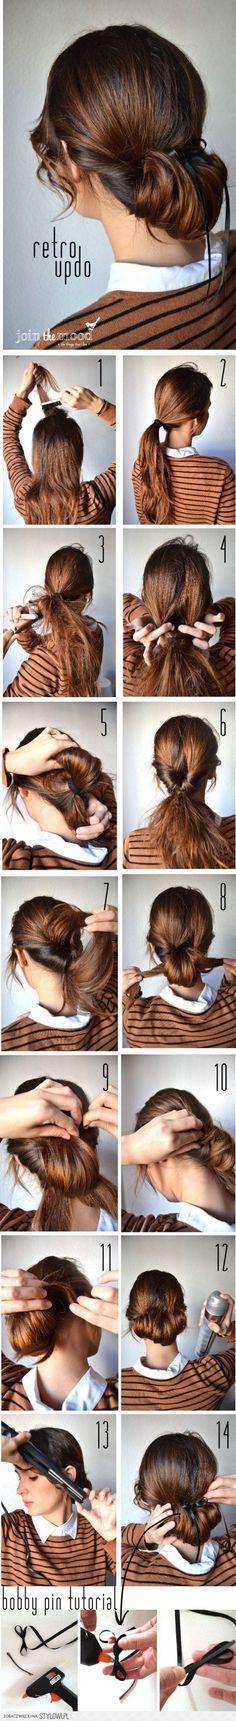 High school hair by Moshi Moshi